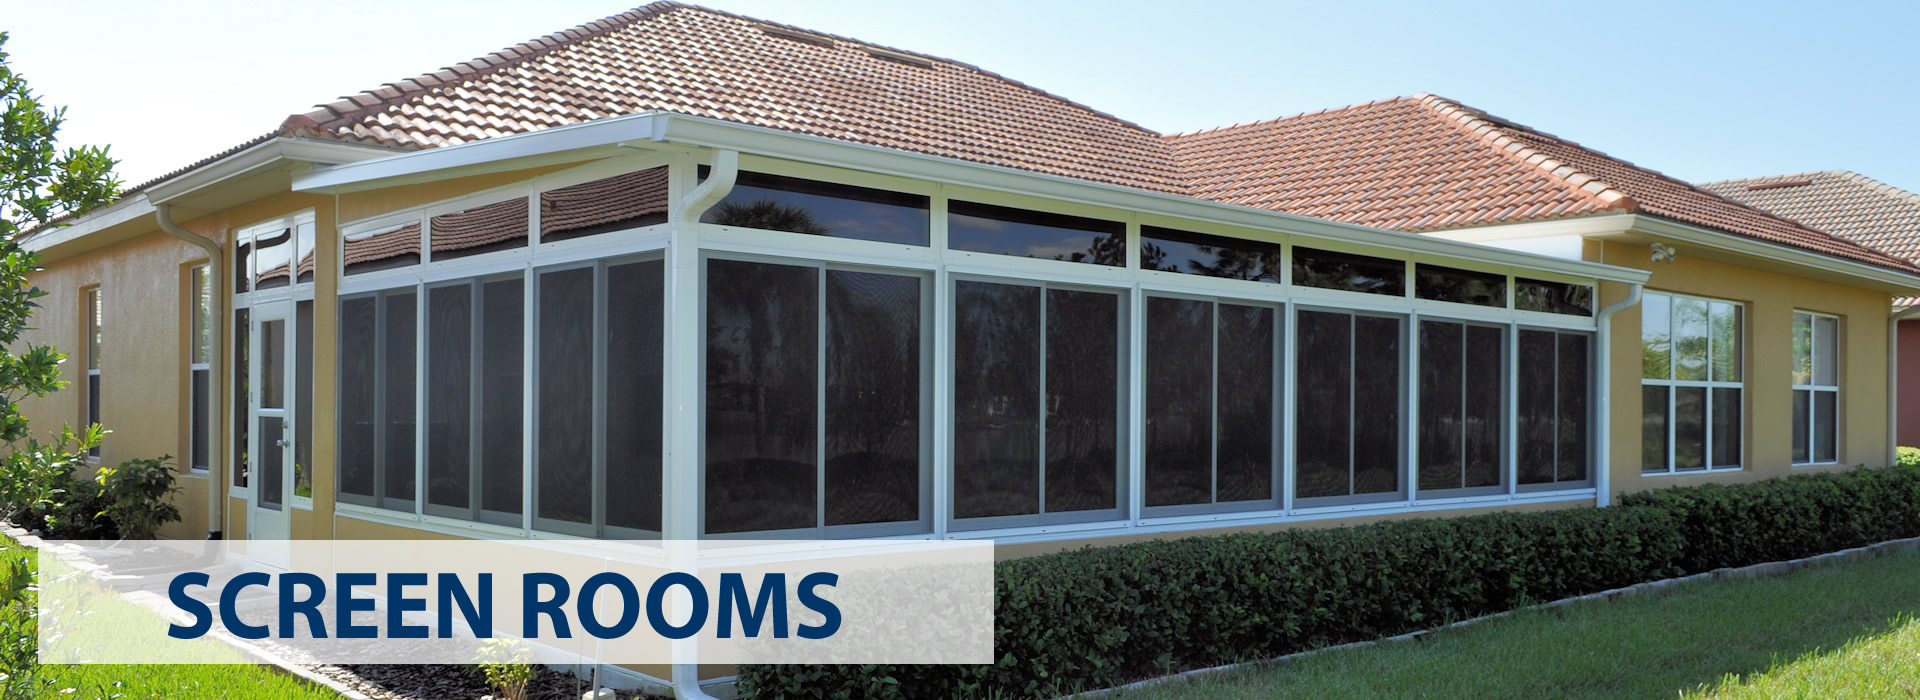 Screen Rooms Clearwater Fl Pool Enclosures Spring Hill Lanai Screening Re Screening Port Richey Hudson Tarpon Springs Pasco Pinellas Hernando In Tampa Bay